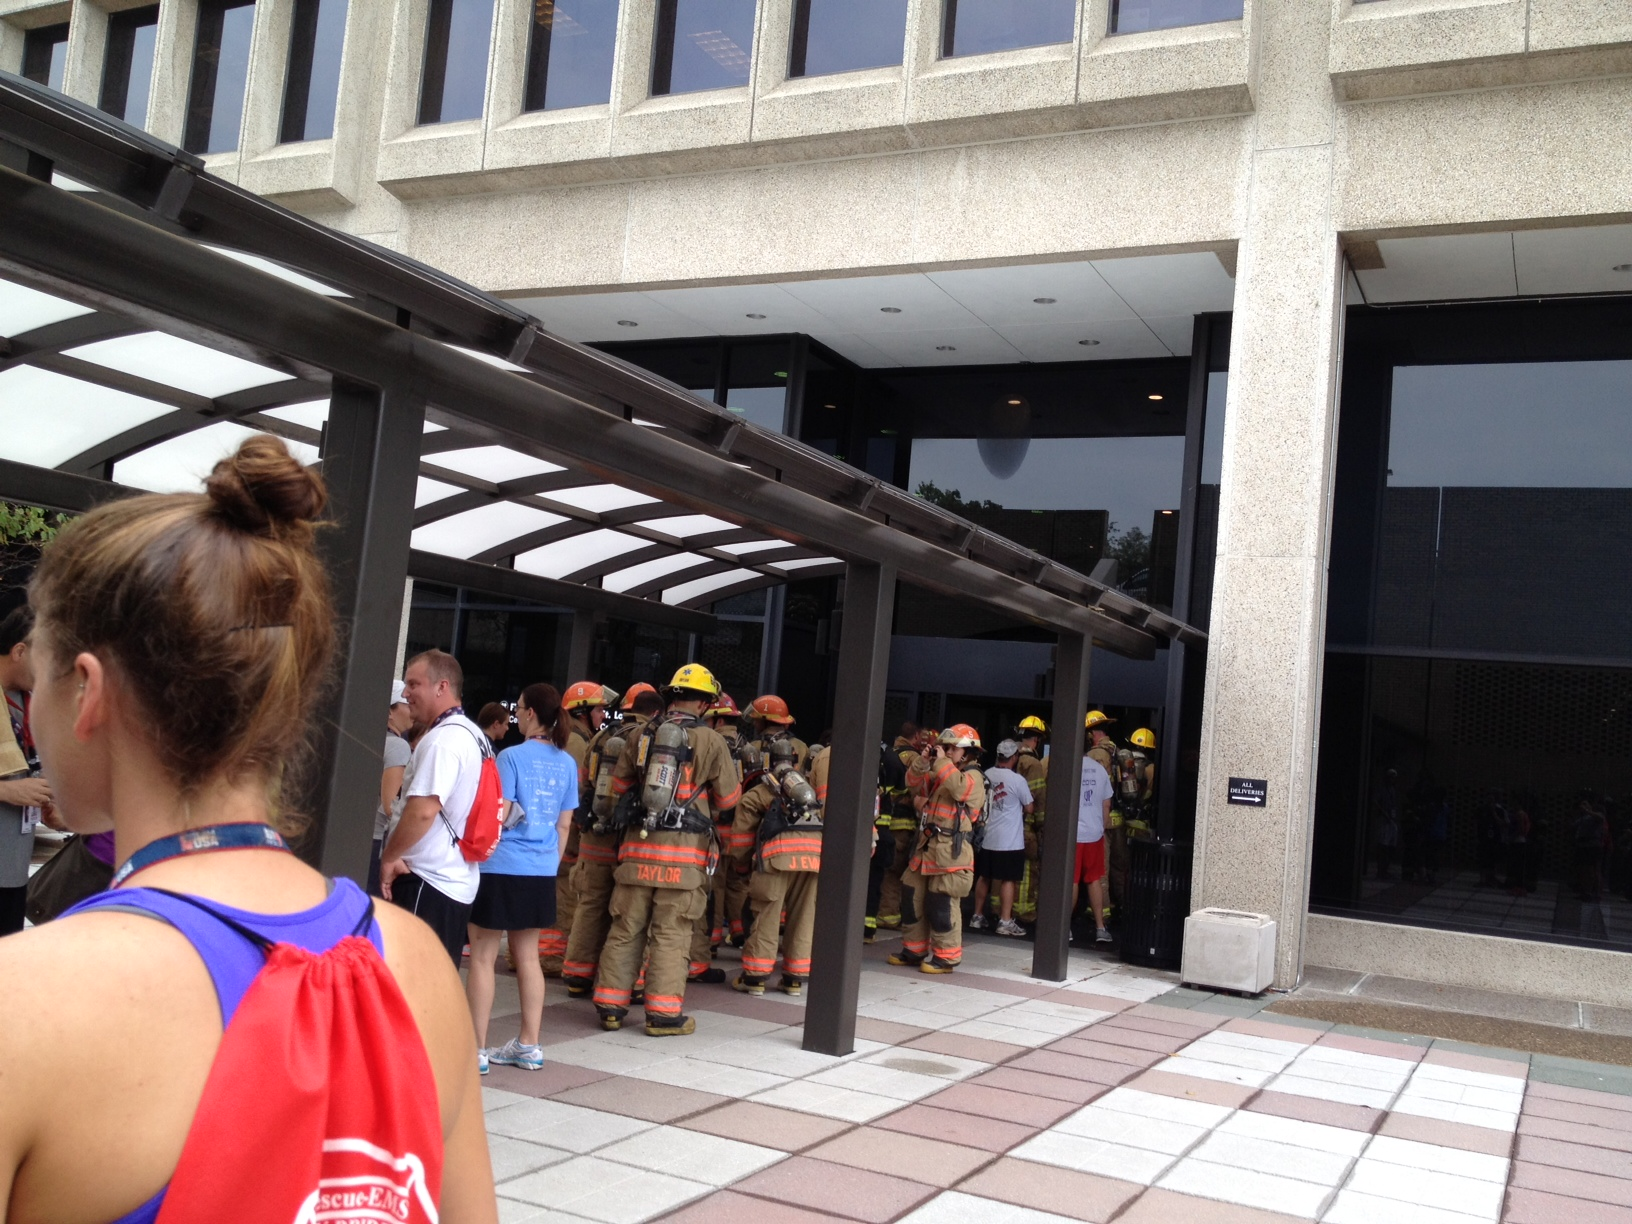 9-11 Memorial Stair Climb Seven